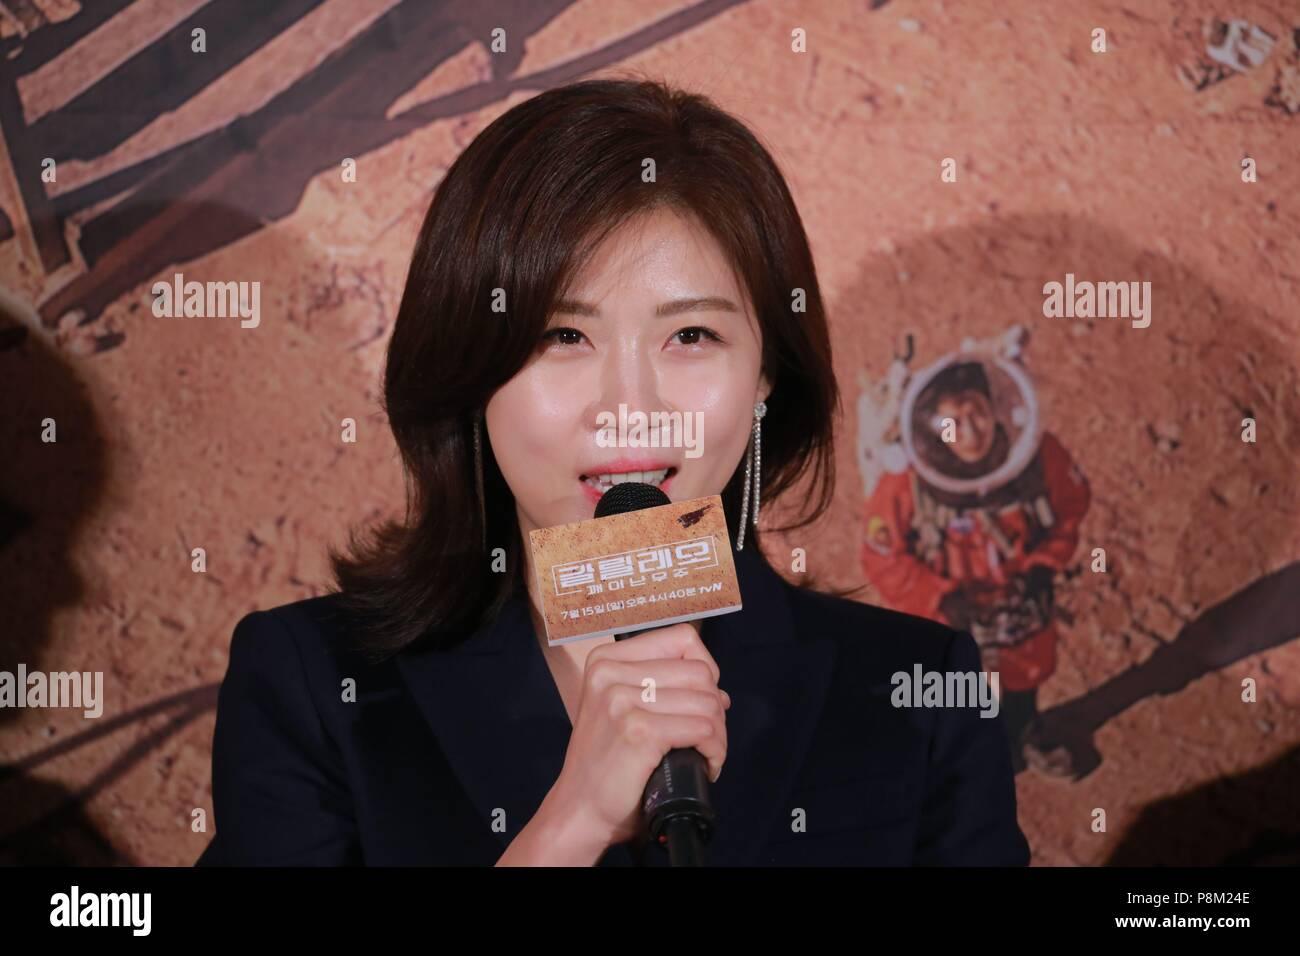 Byung Ji Kim Stock Photos & Byung Ji Kim Stock Images - Alamy